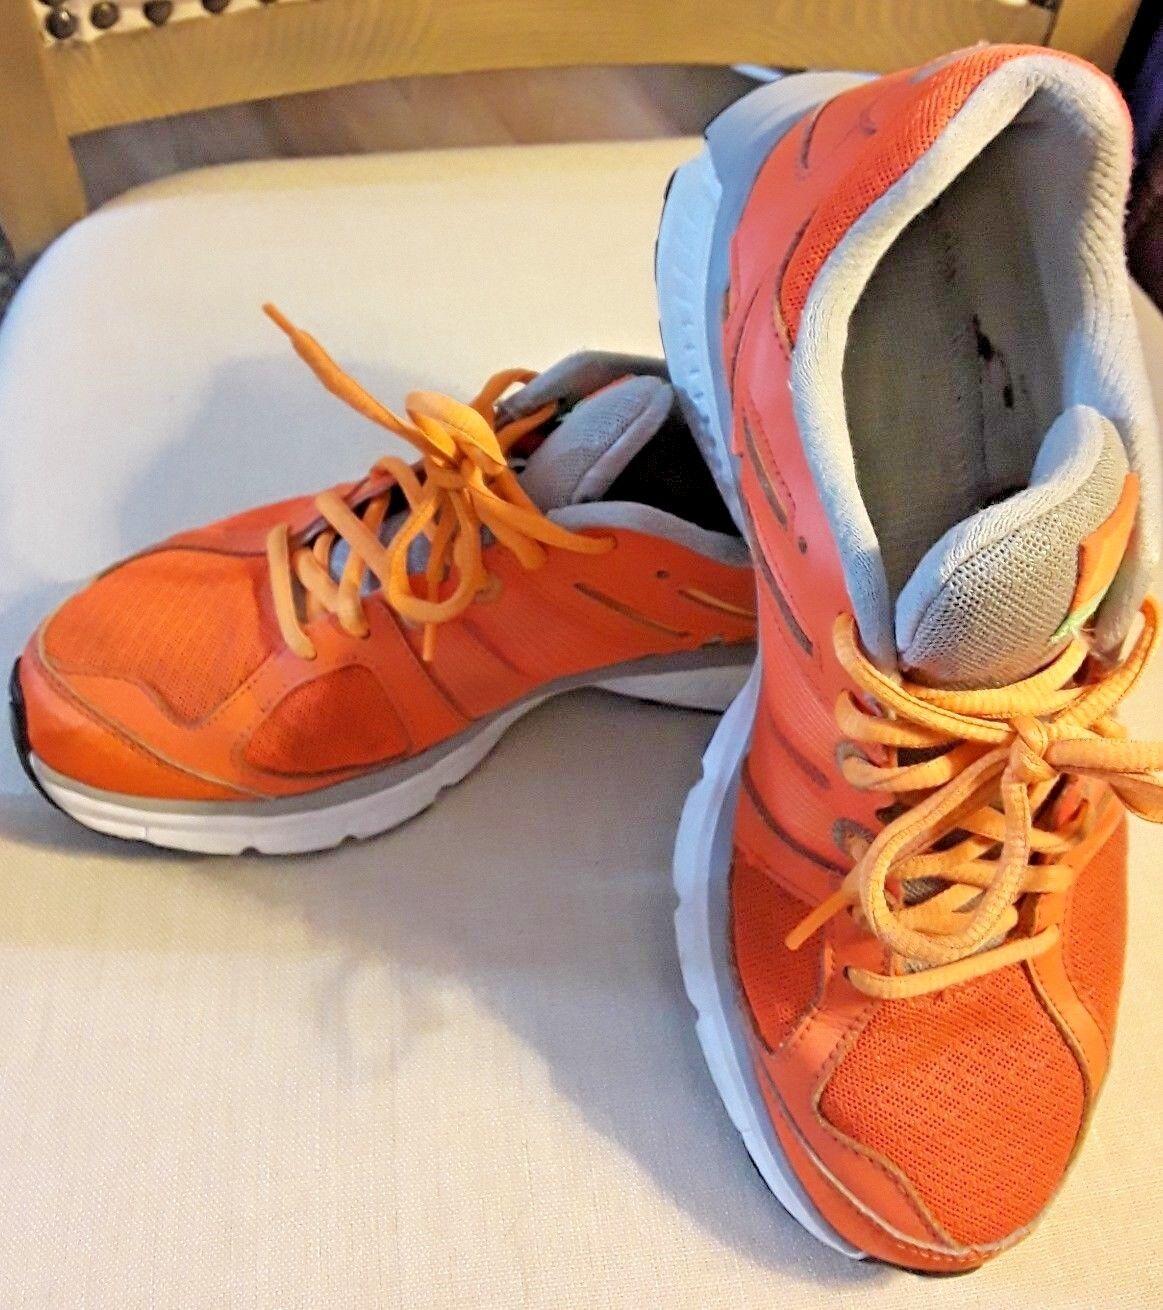 Nike Anodyne Dd Orange and gray  Comfortable Cheap women's shoes women's shoes